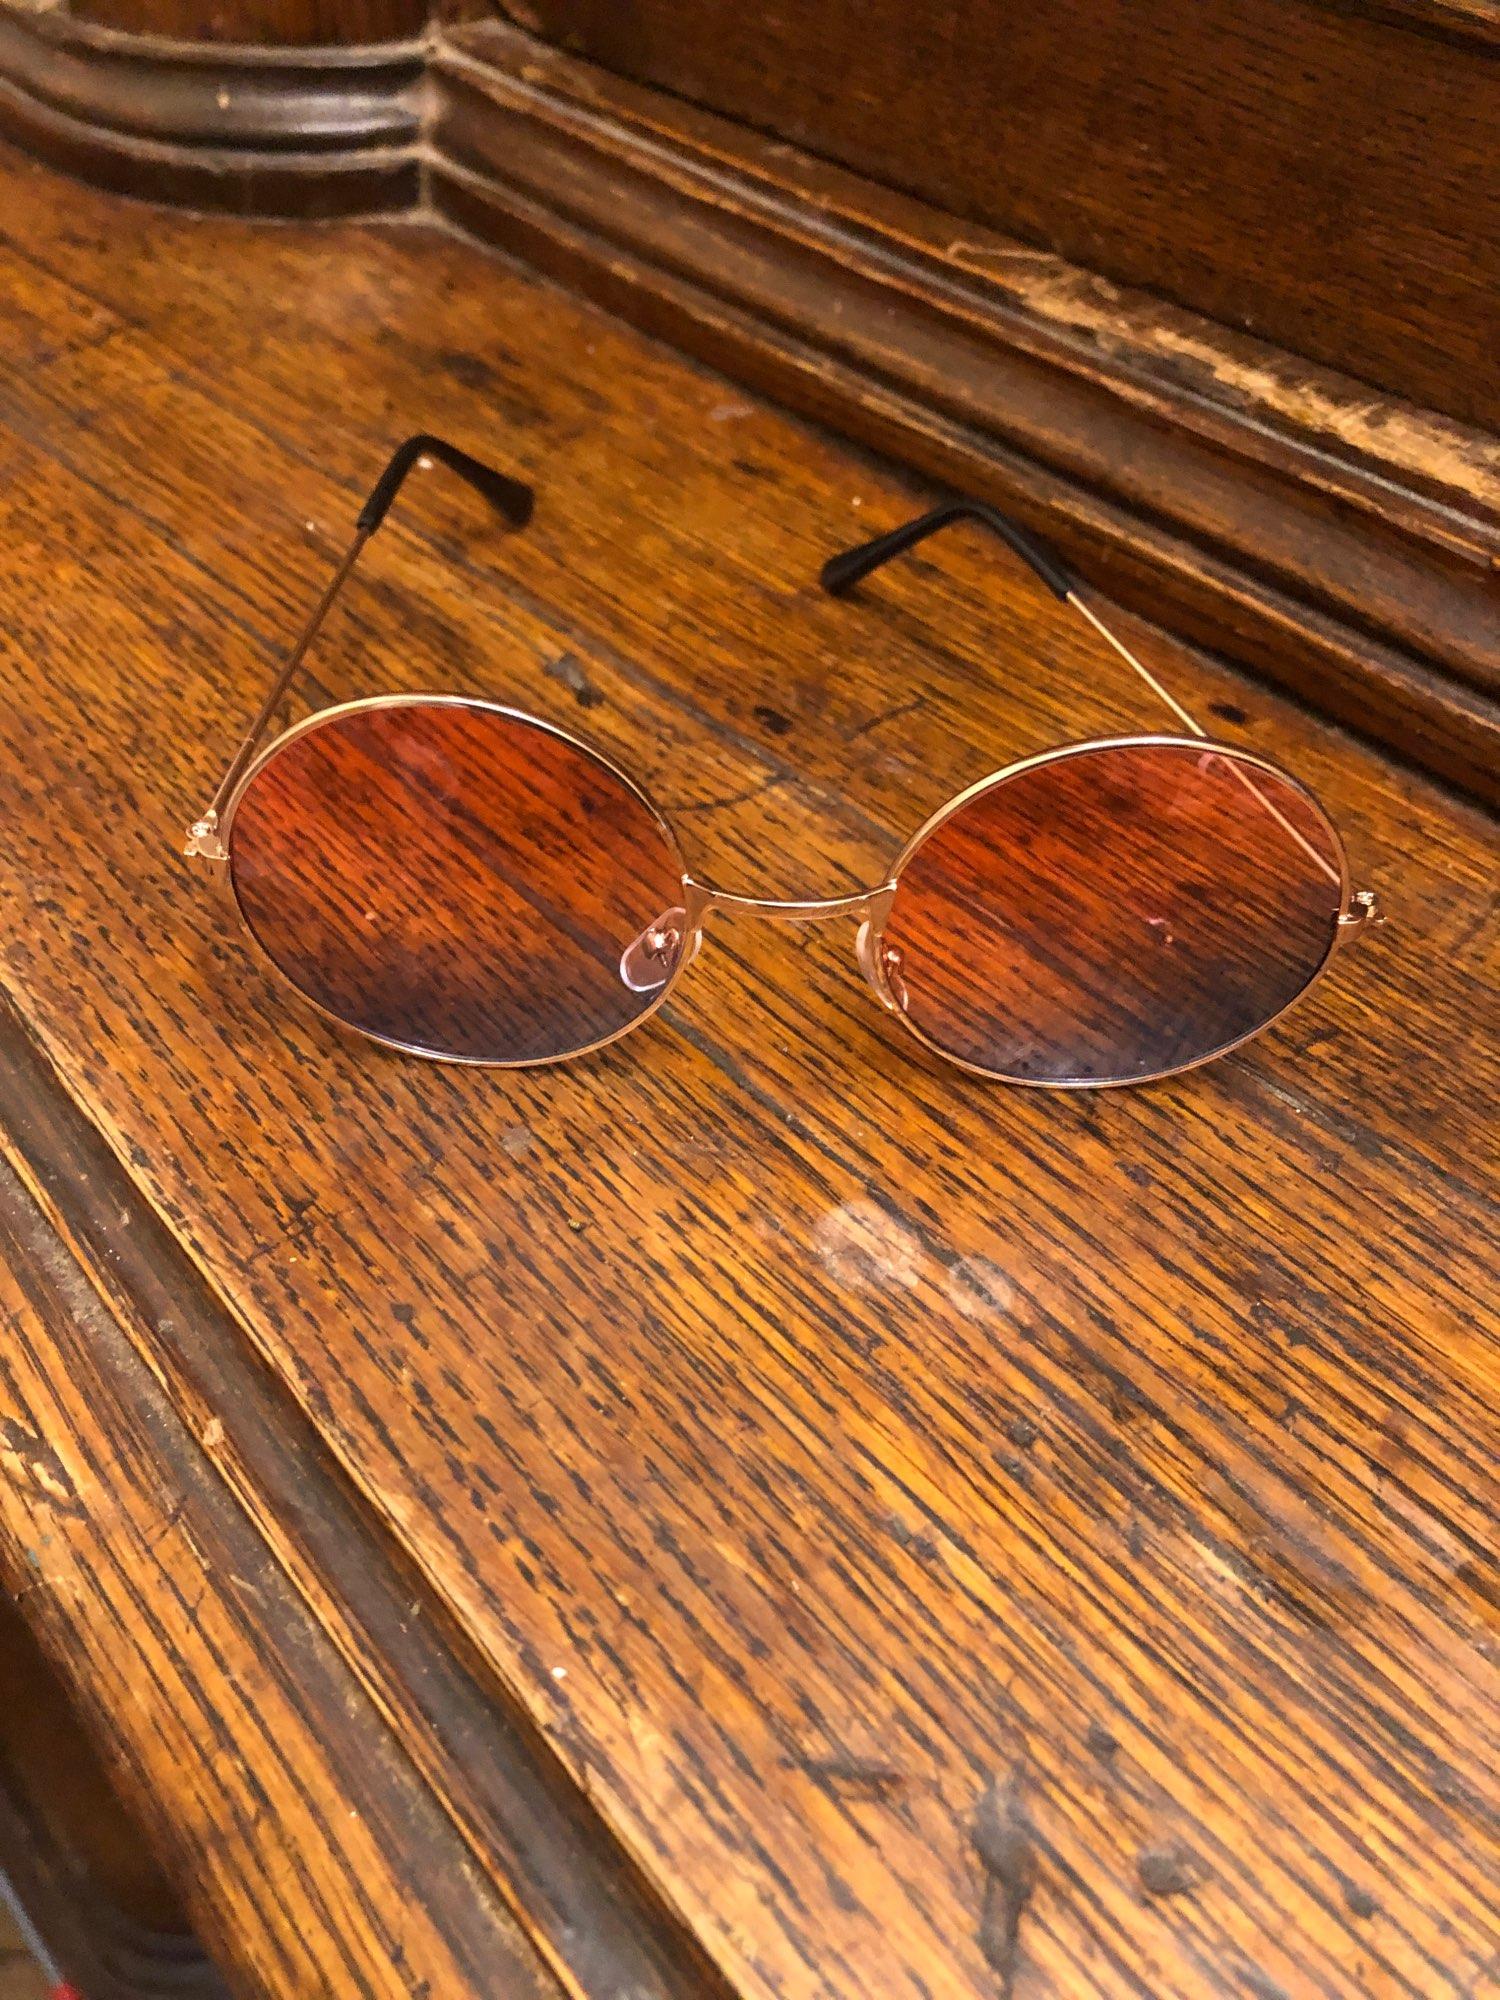 SAKFHIA Small Round Colorful Mirror Vintage Sunglasses for Women photo review